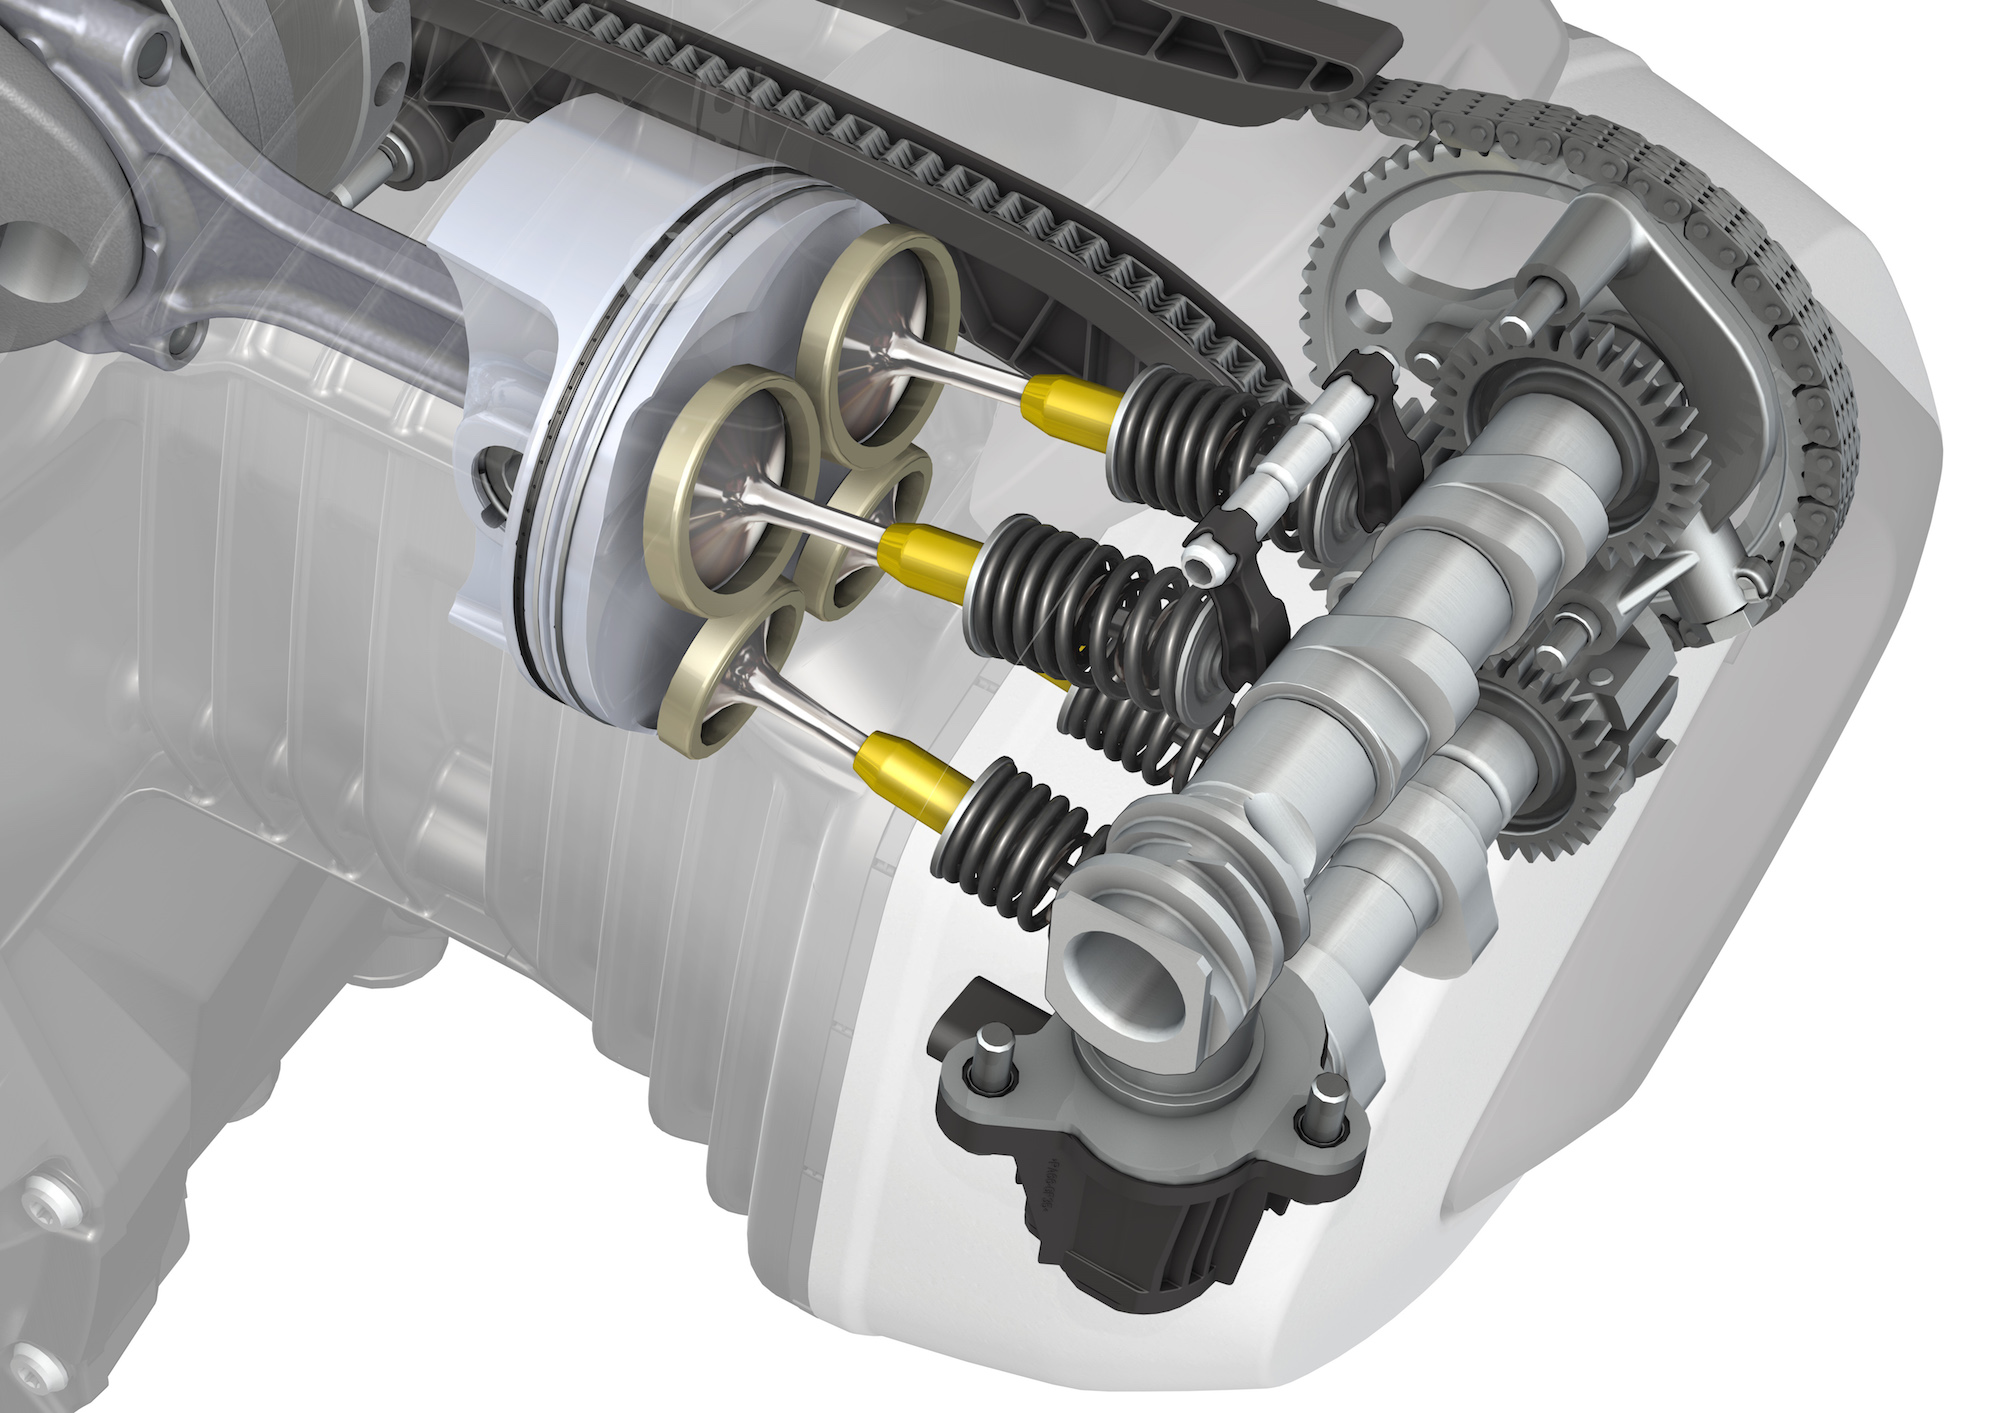 2019 R1250 ShiftCam engine Detail